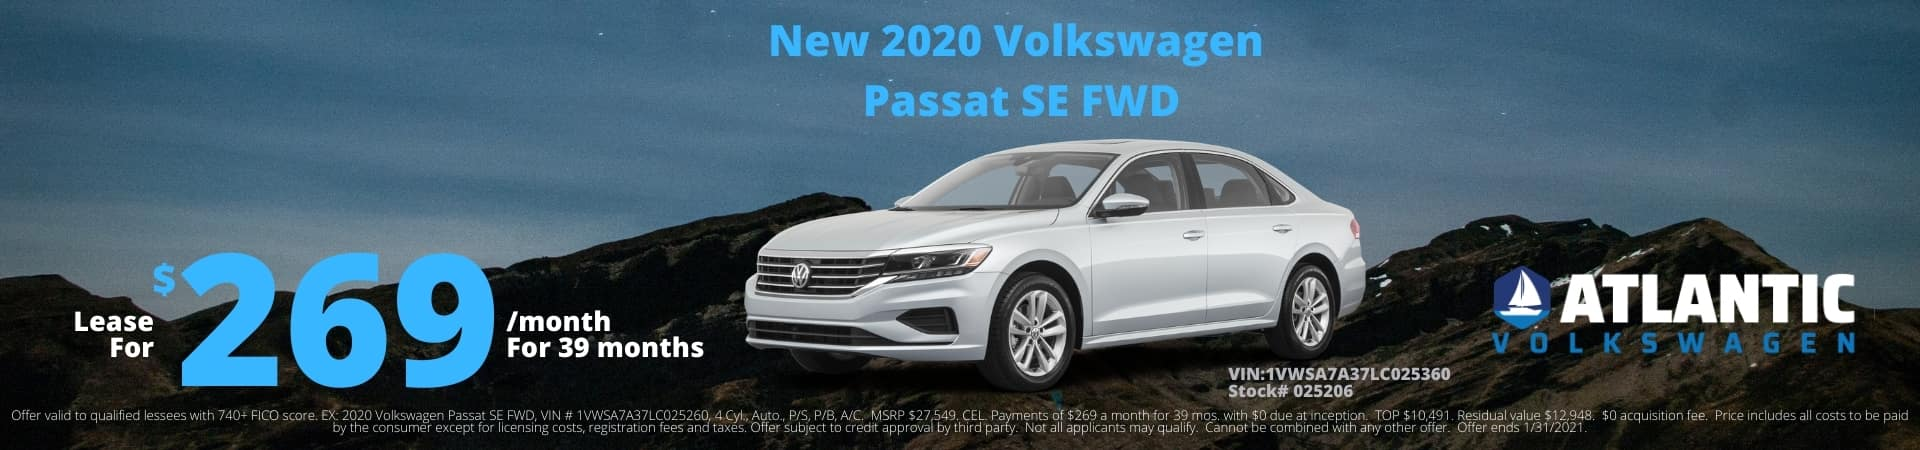 2020-12 Atlantic VW 2020 VW Passat SE FWD 1920×450